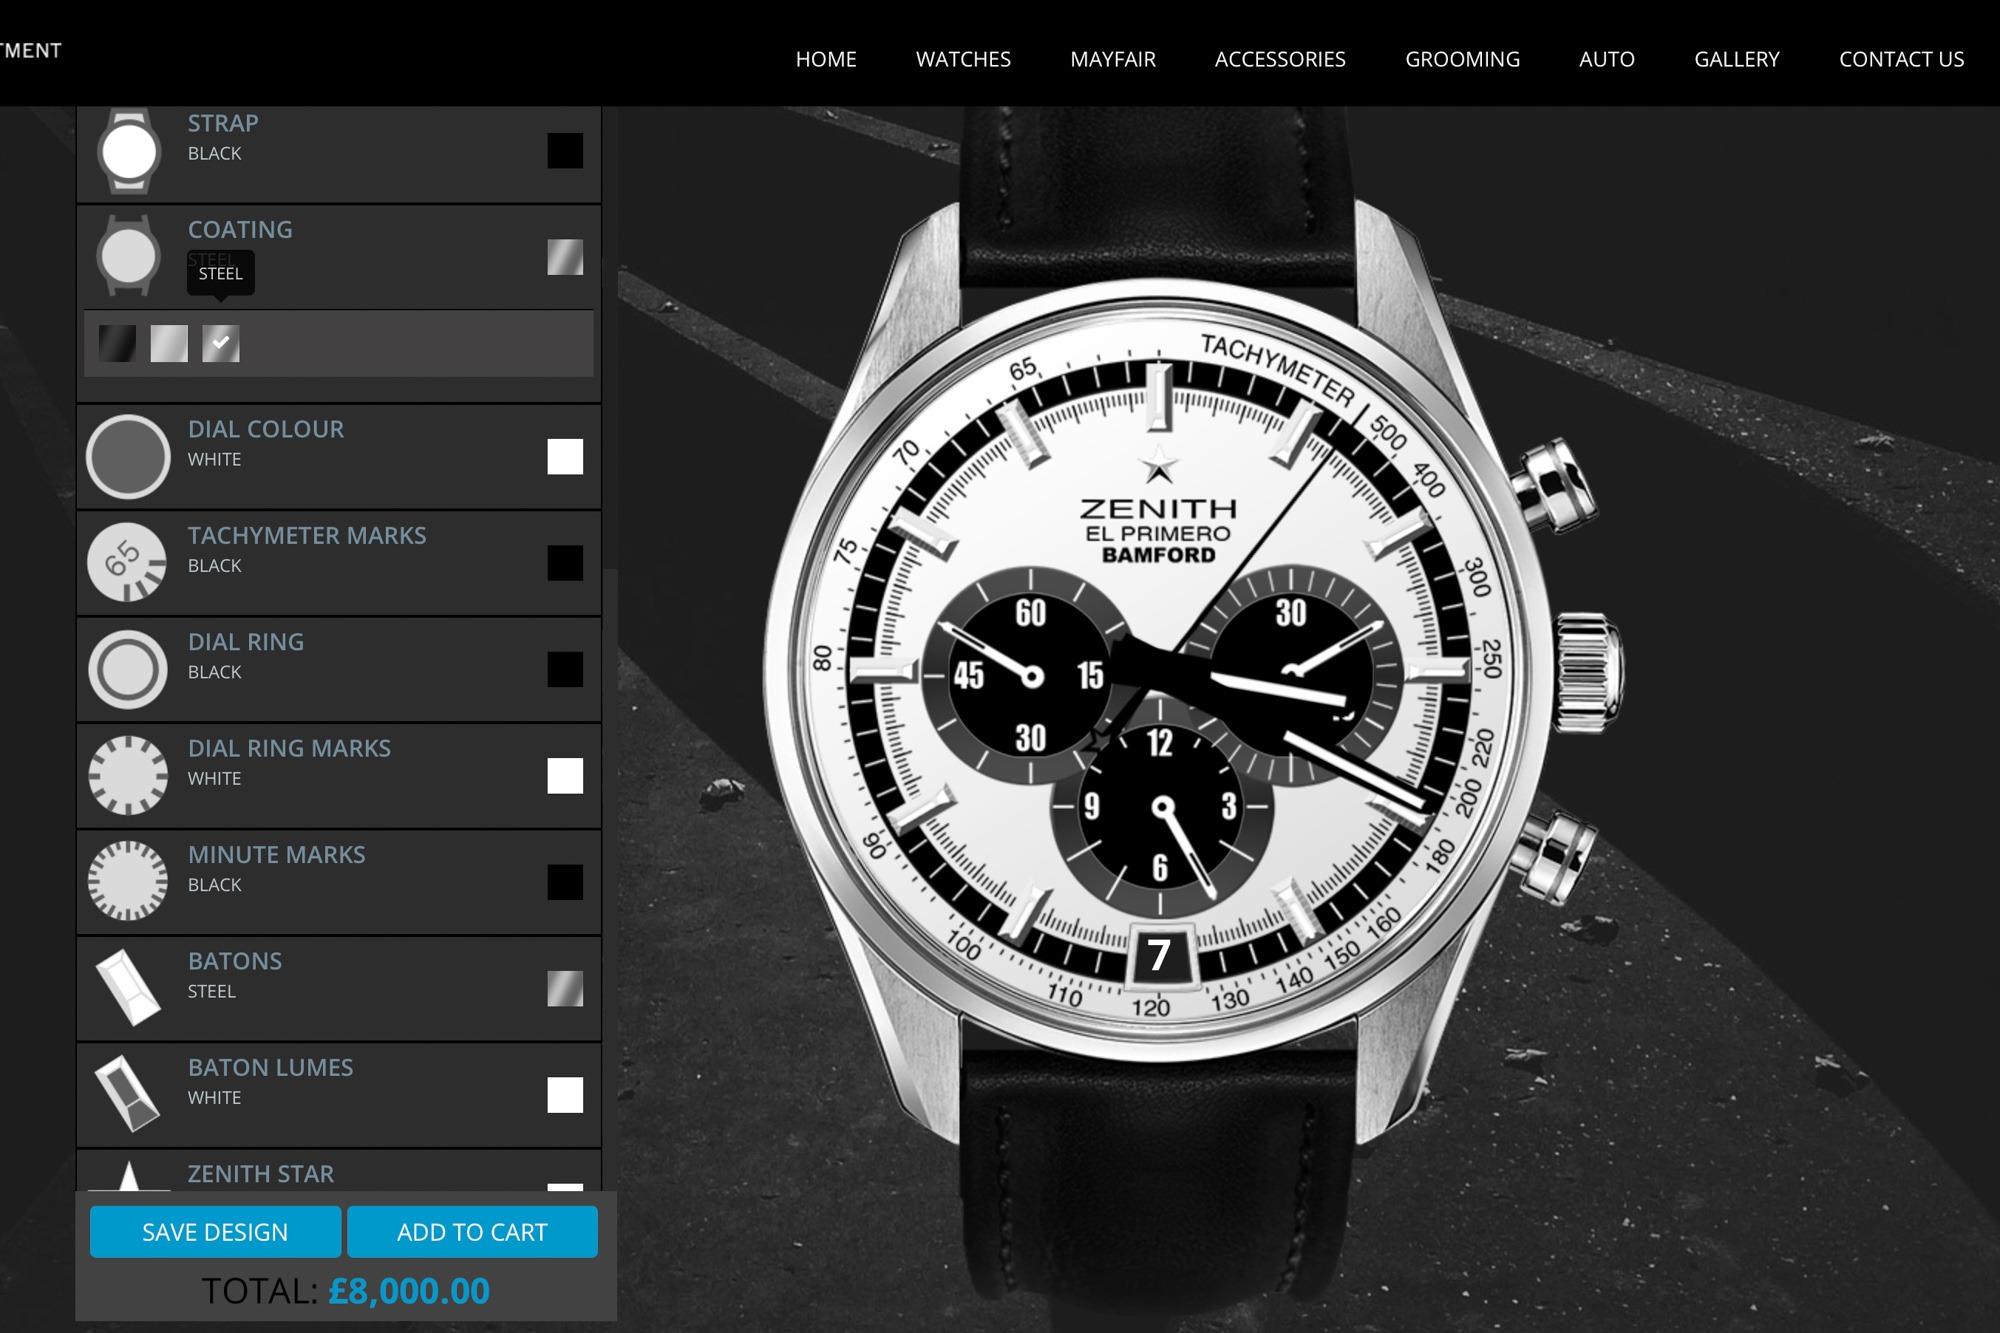 Zenith -Bamford - Personnalisation de montres BWD